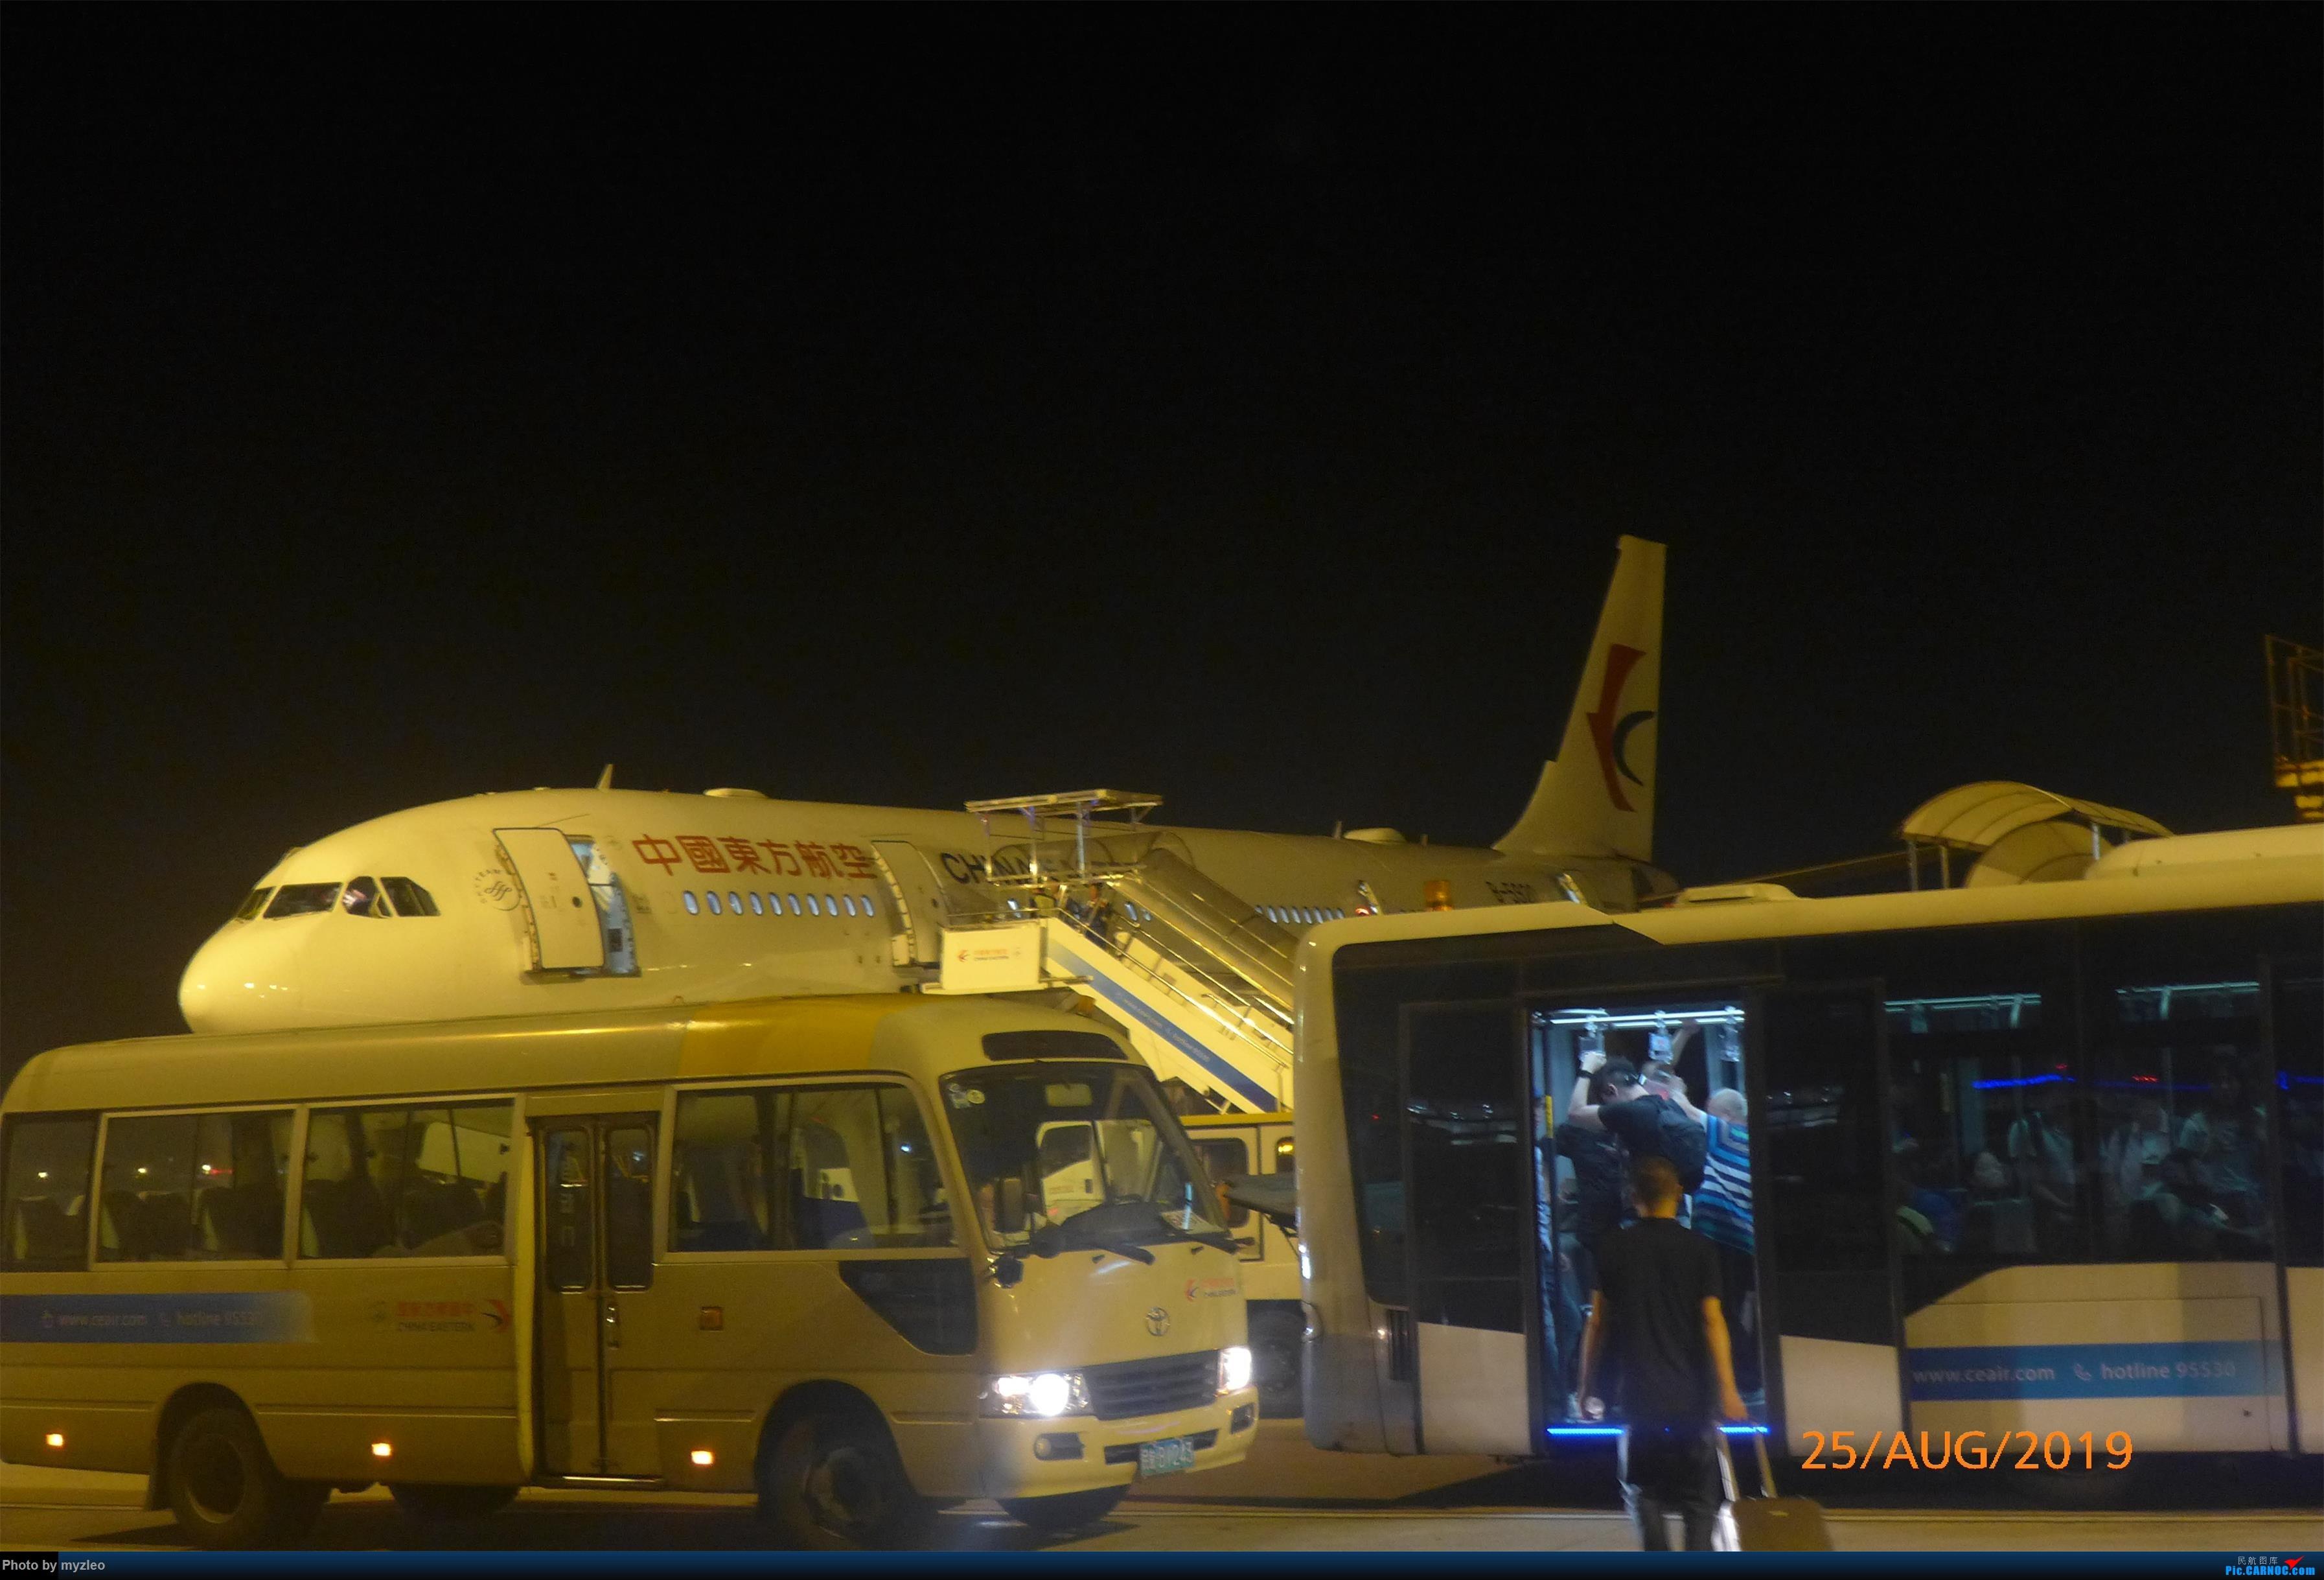 Re:[原创]【myzleo的游记5.3】在大连各景点穿梭不停,坐东航319返回上海 AIRBUS A330-200 B-5920 中国上海浦东国际机场